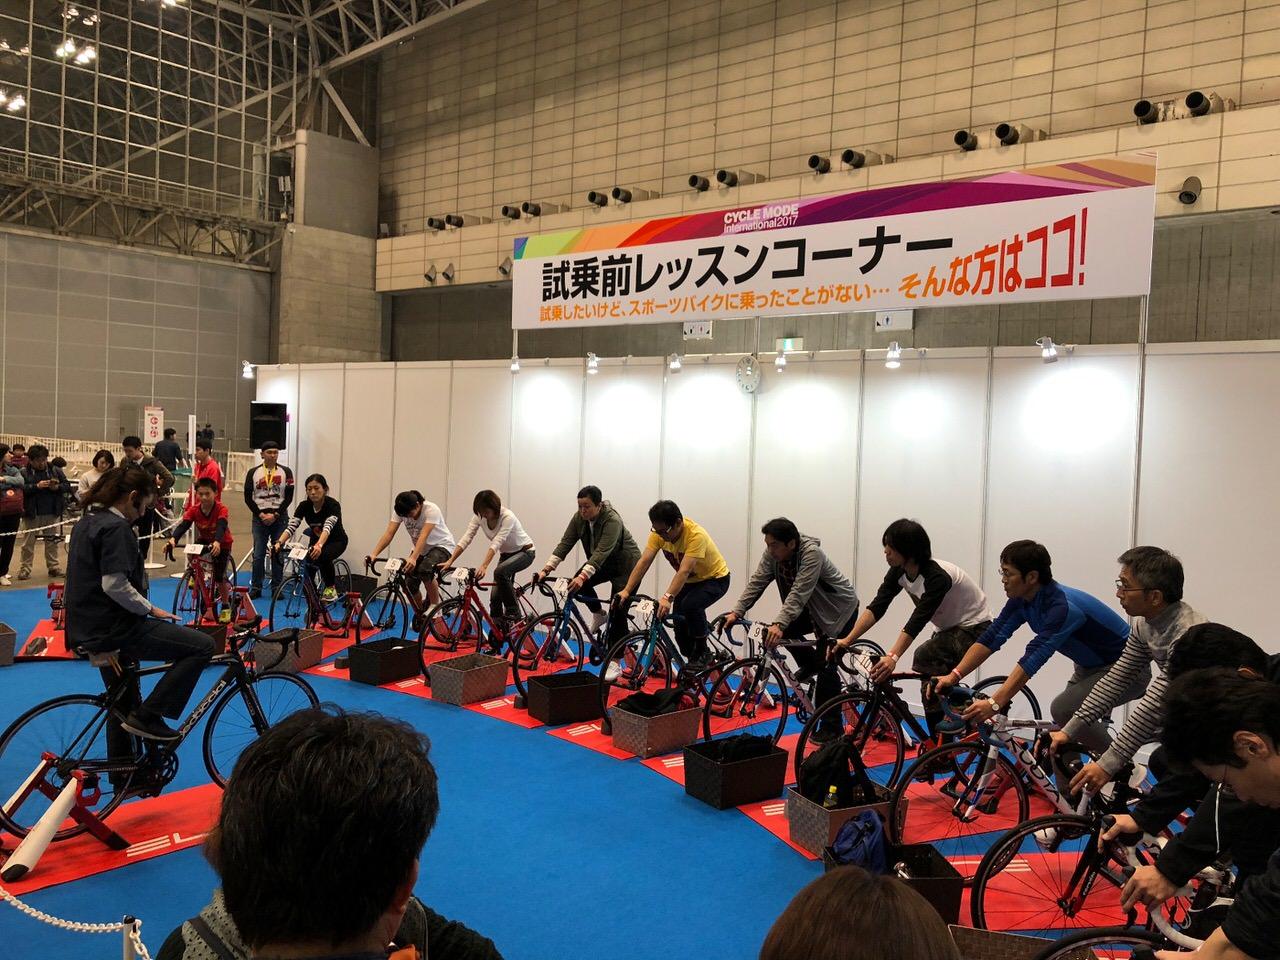 Cyclemode 0549